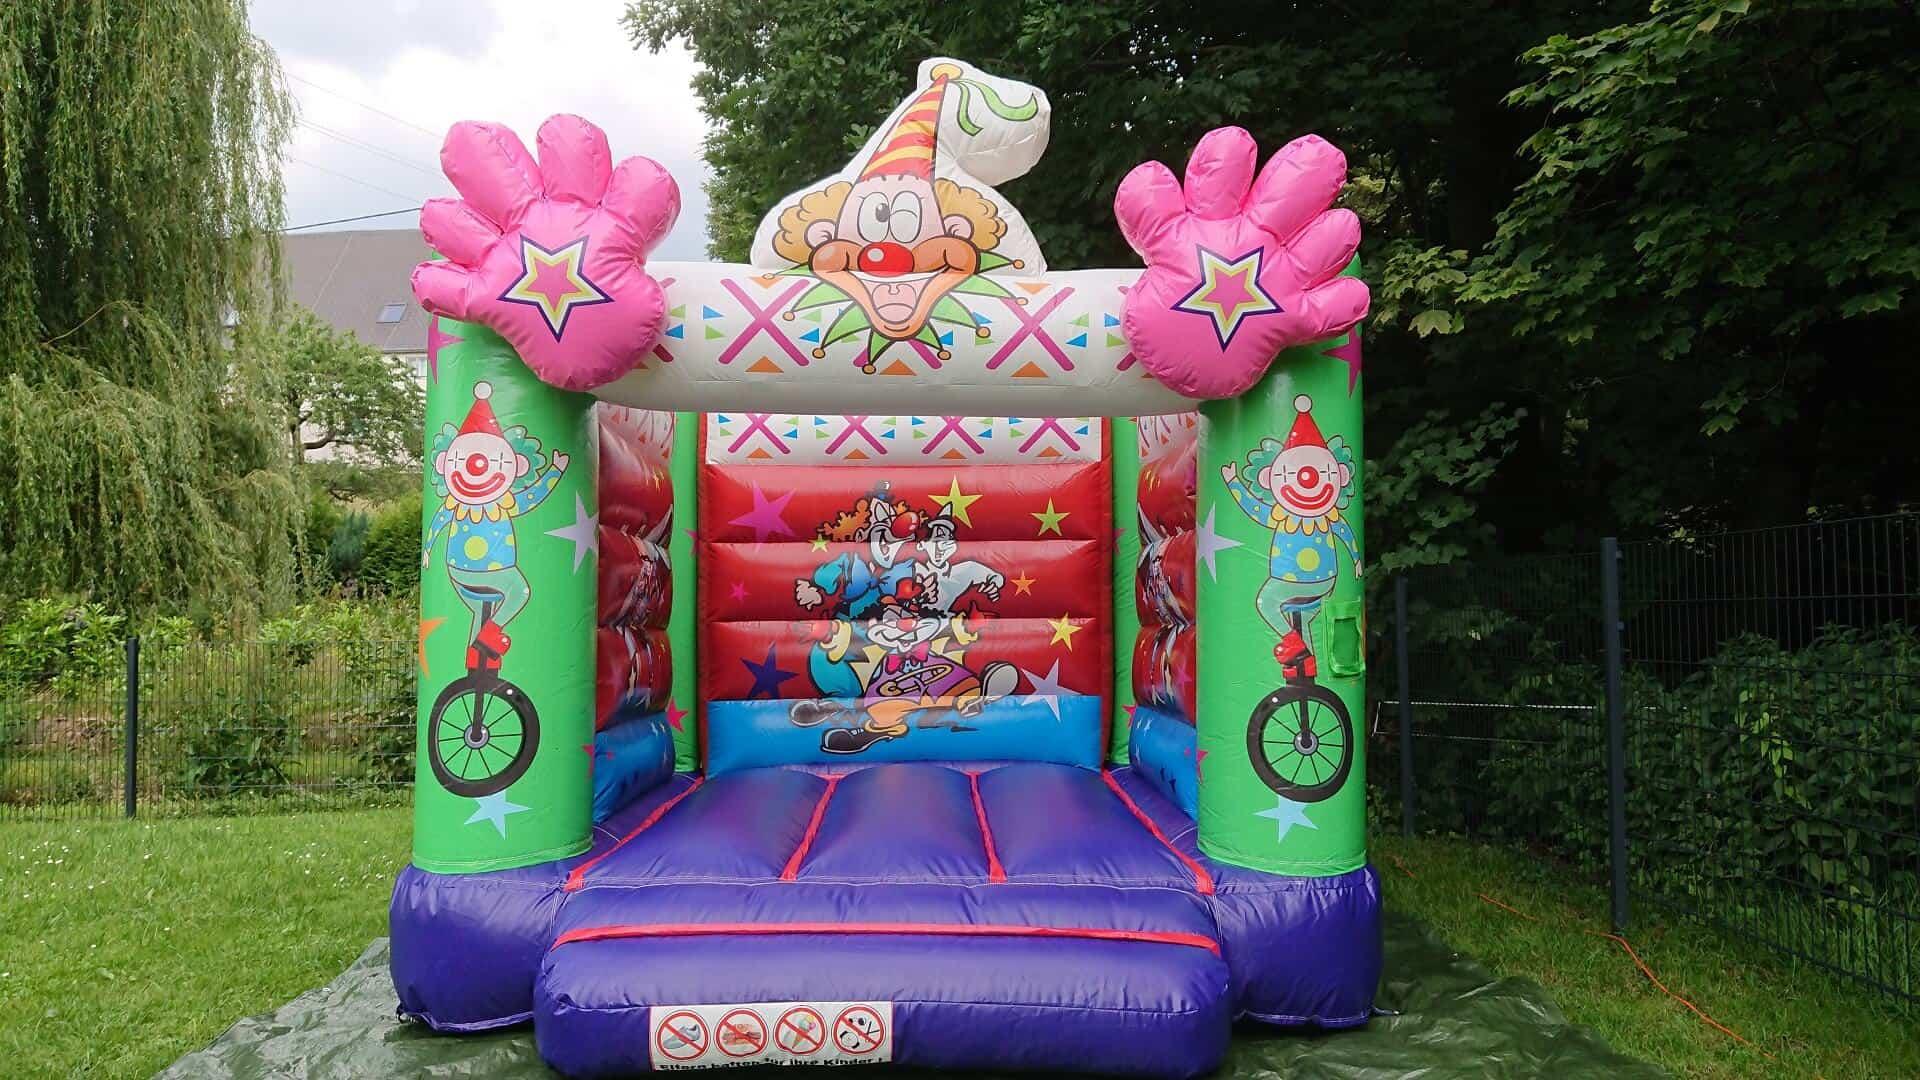 Kinder-Hüpfburg Clown mieten